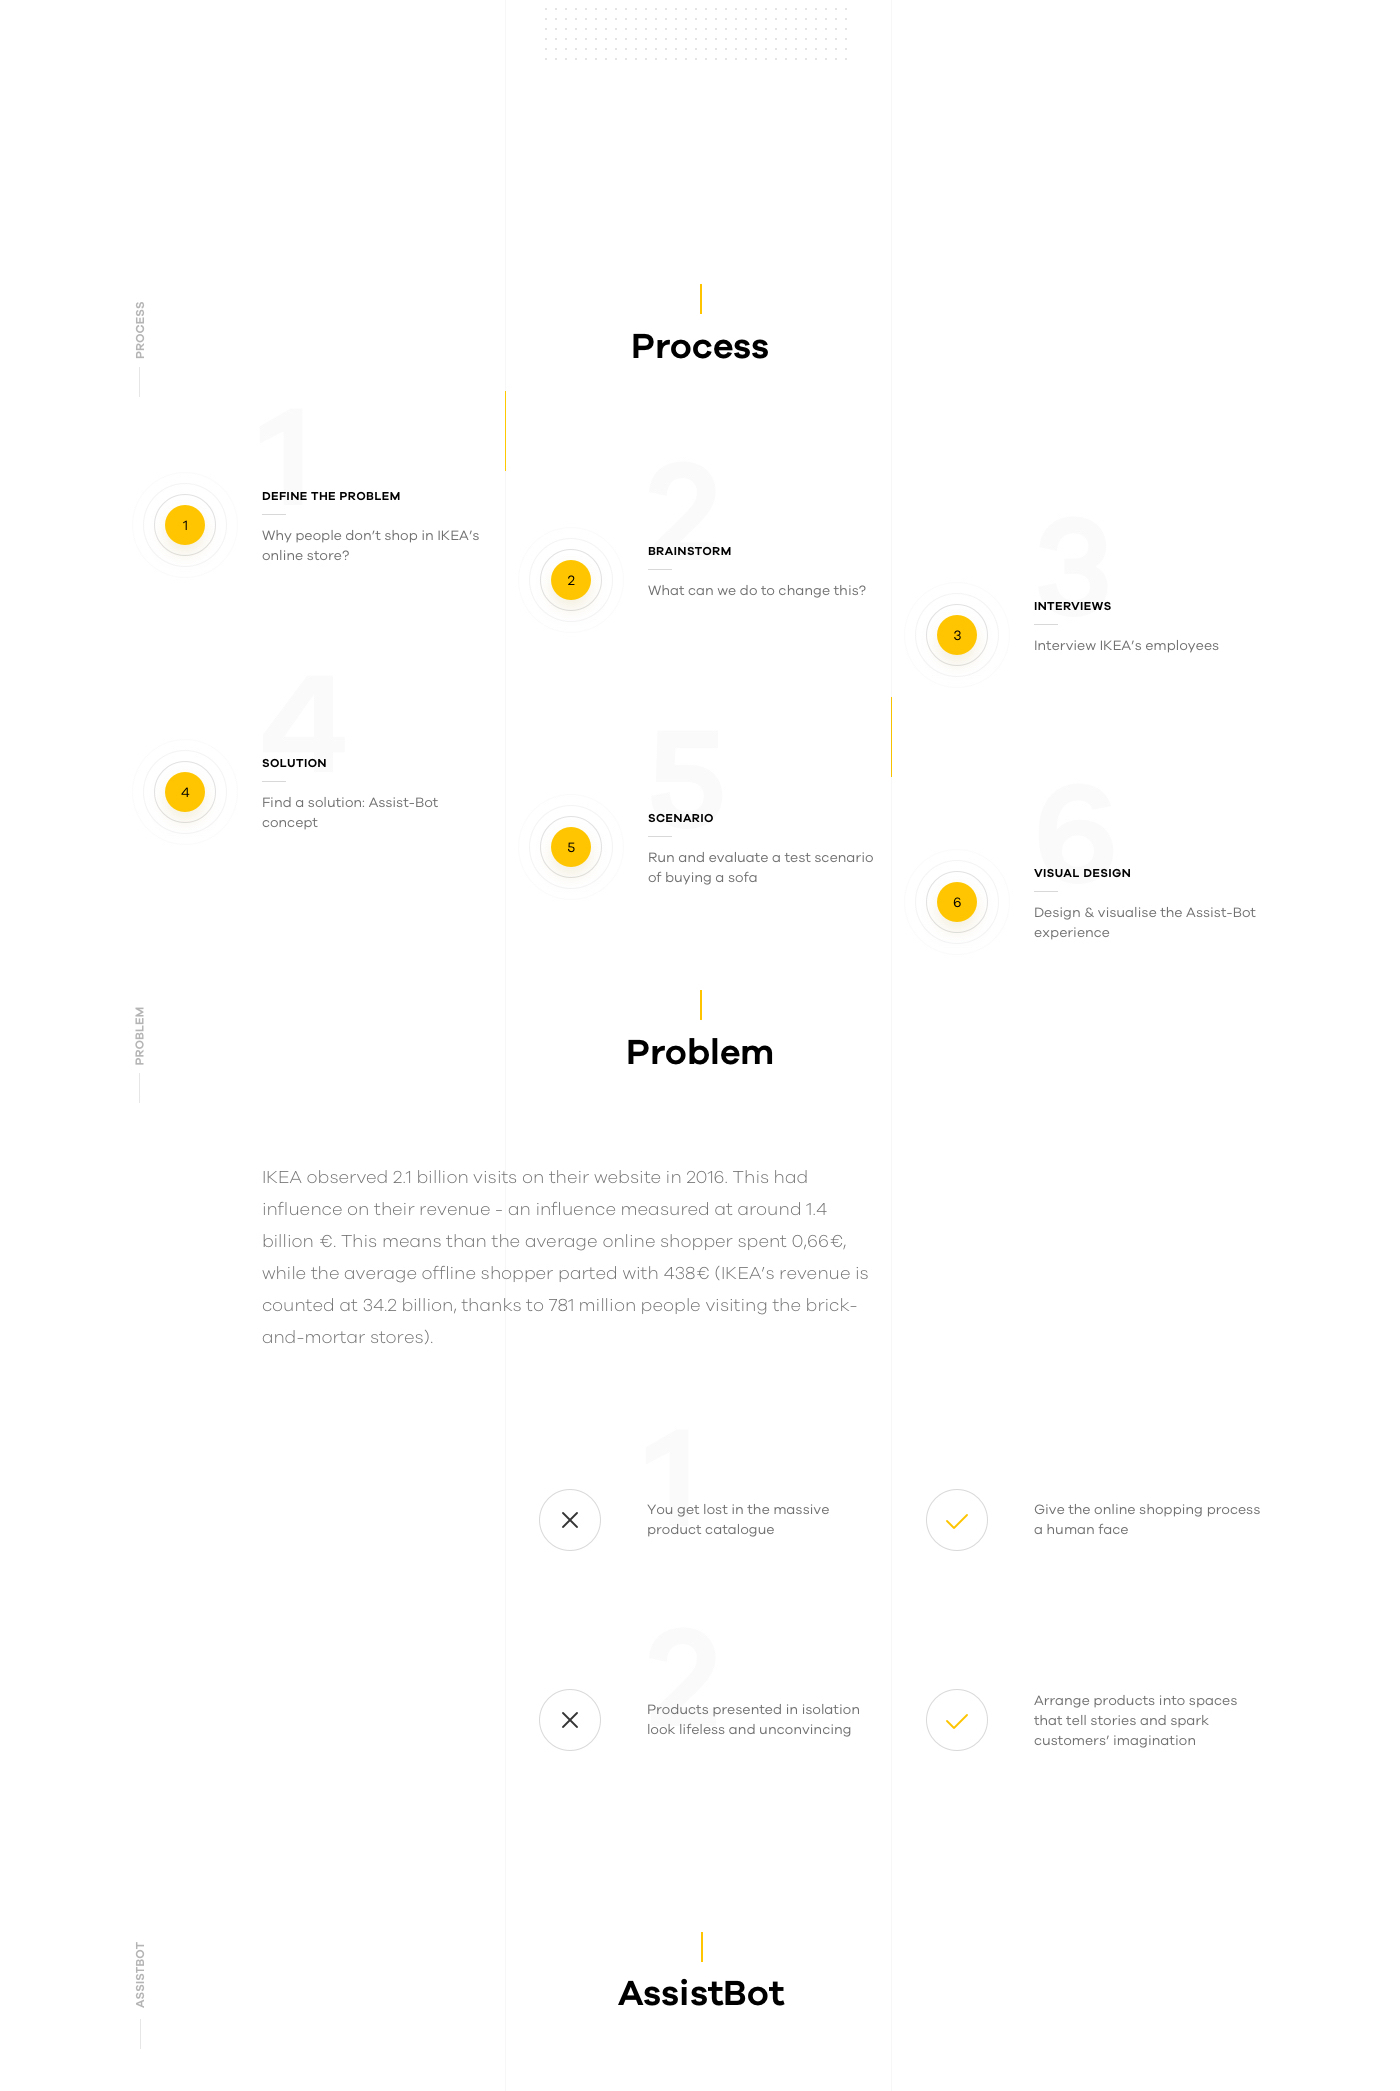 ikea e-commerce concept bot app redesign virtual assistant